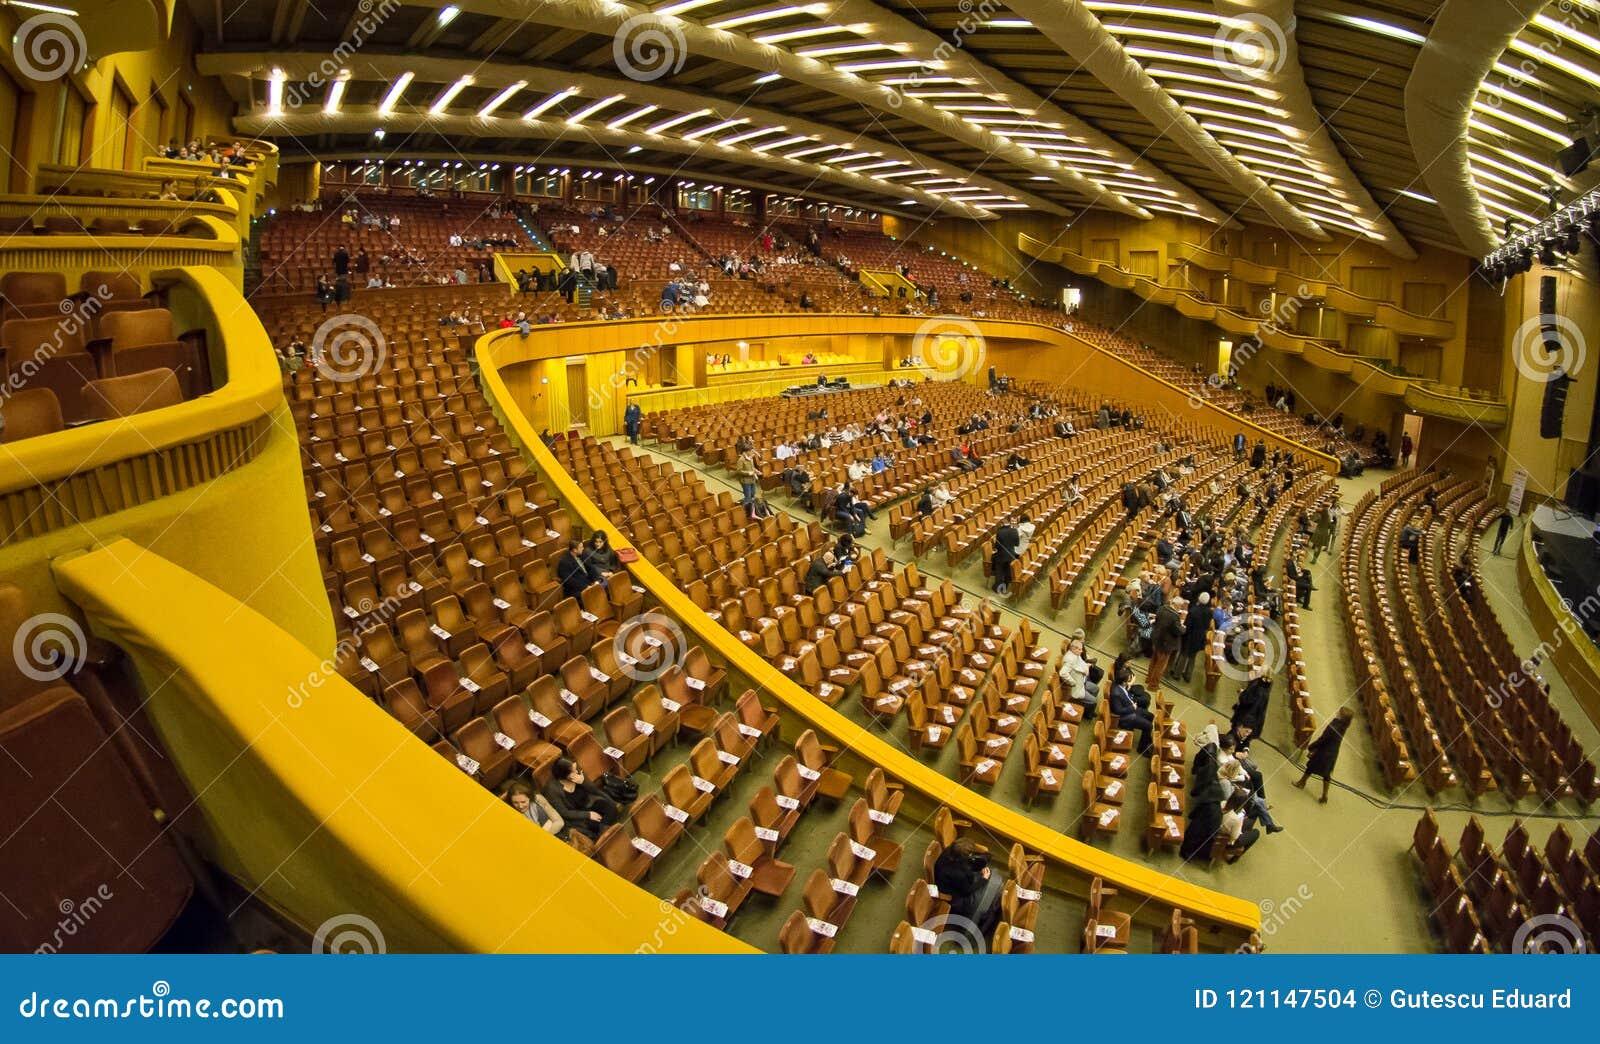 Интерьер концертного зала Бухареста Sala Palatului